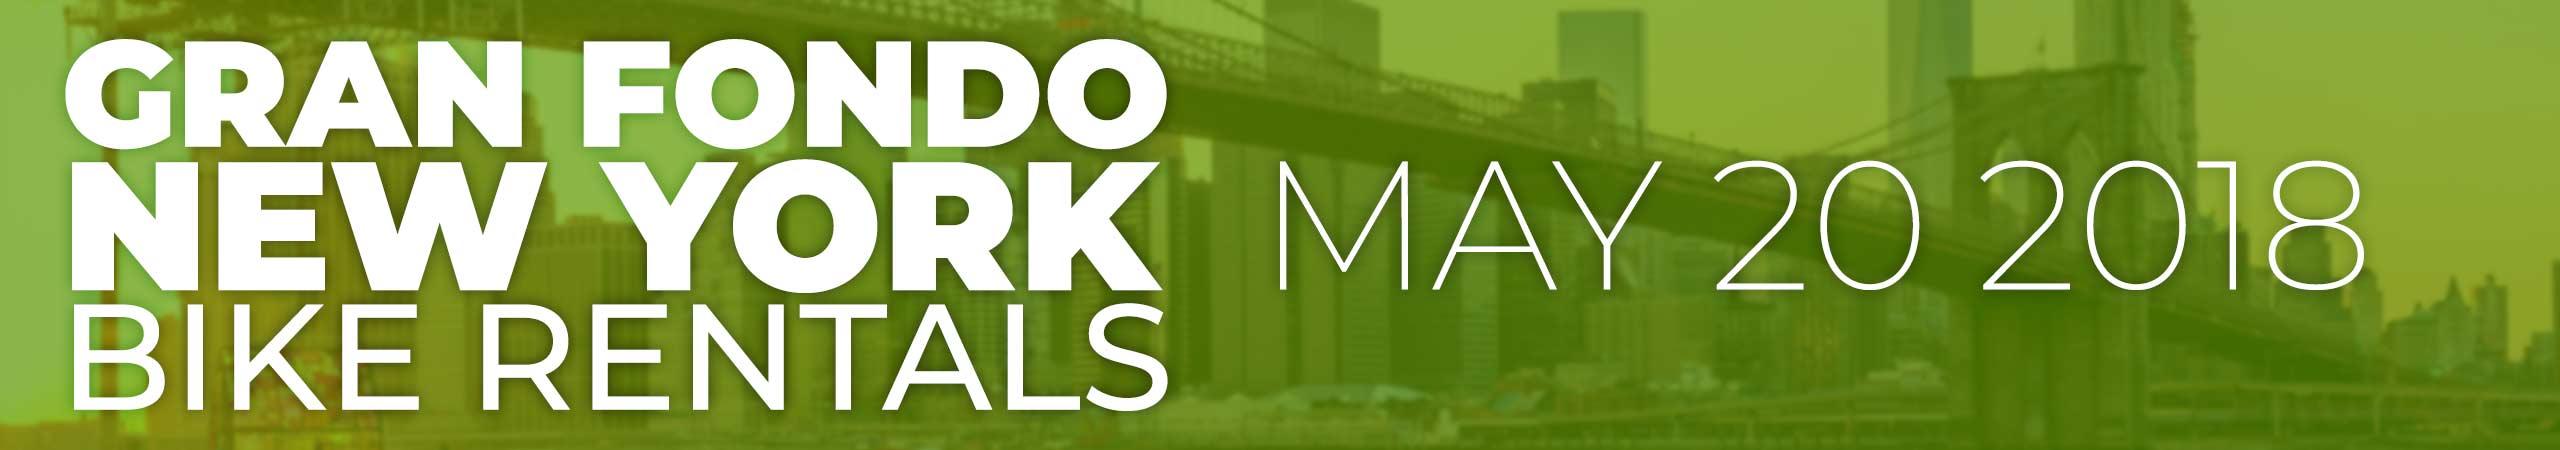 2018 Gran Fondo NY Bike Rentals